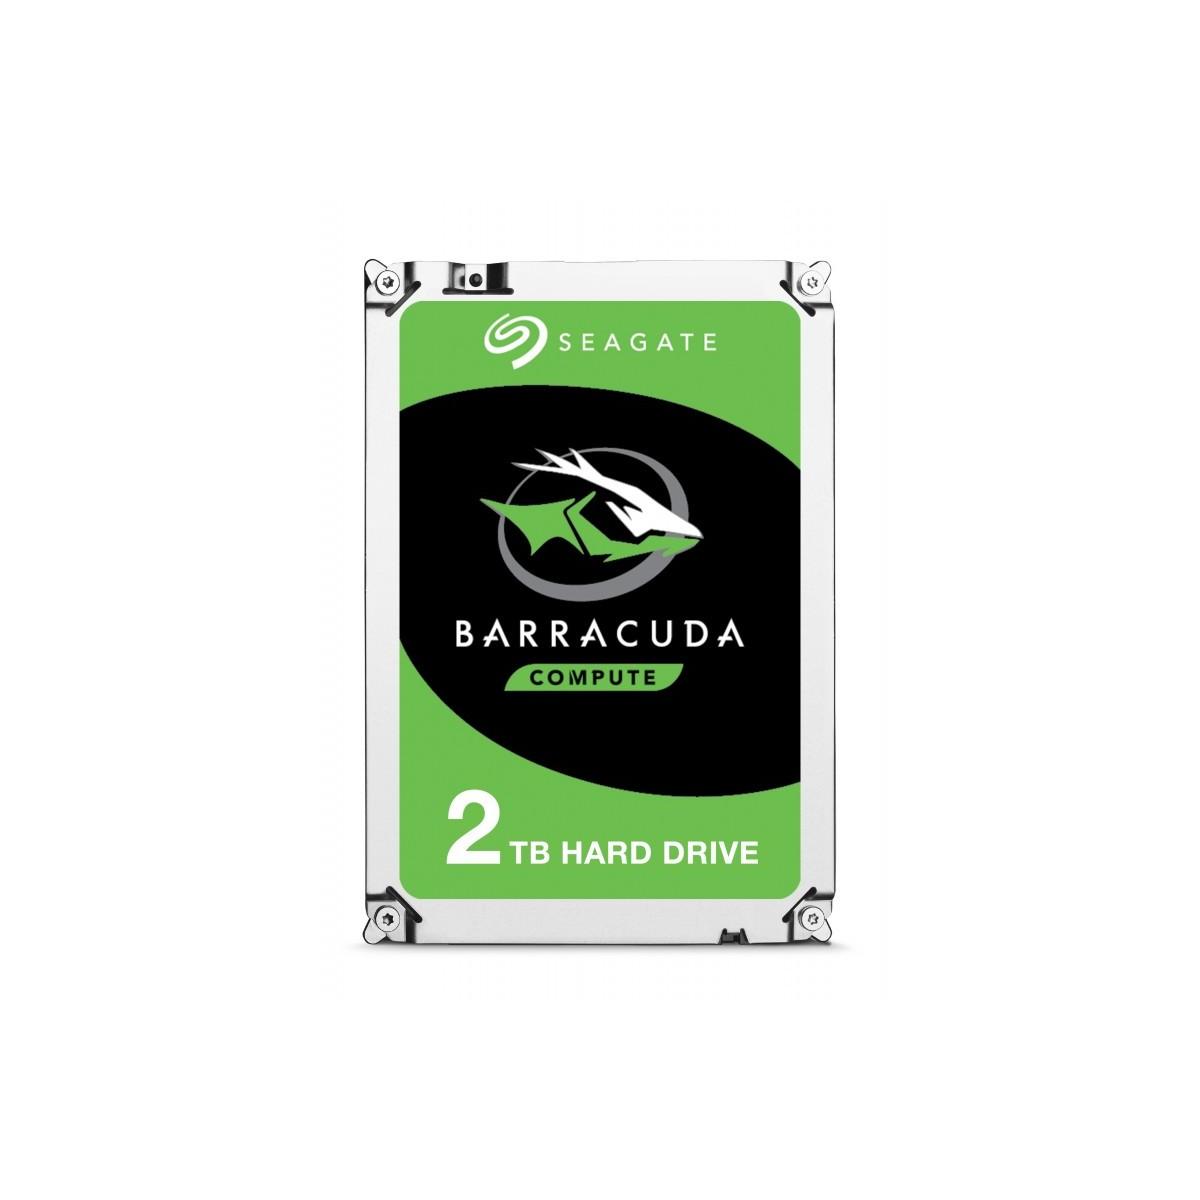 "Seagate Barracuda disco duro interno 3.5"" 2 TB Serial ATA 3"